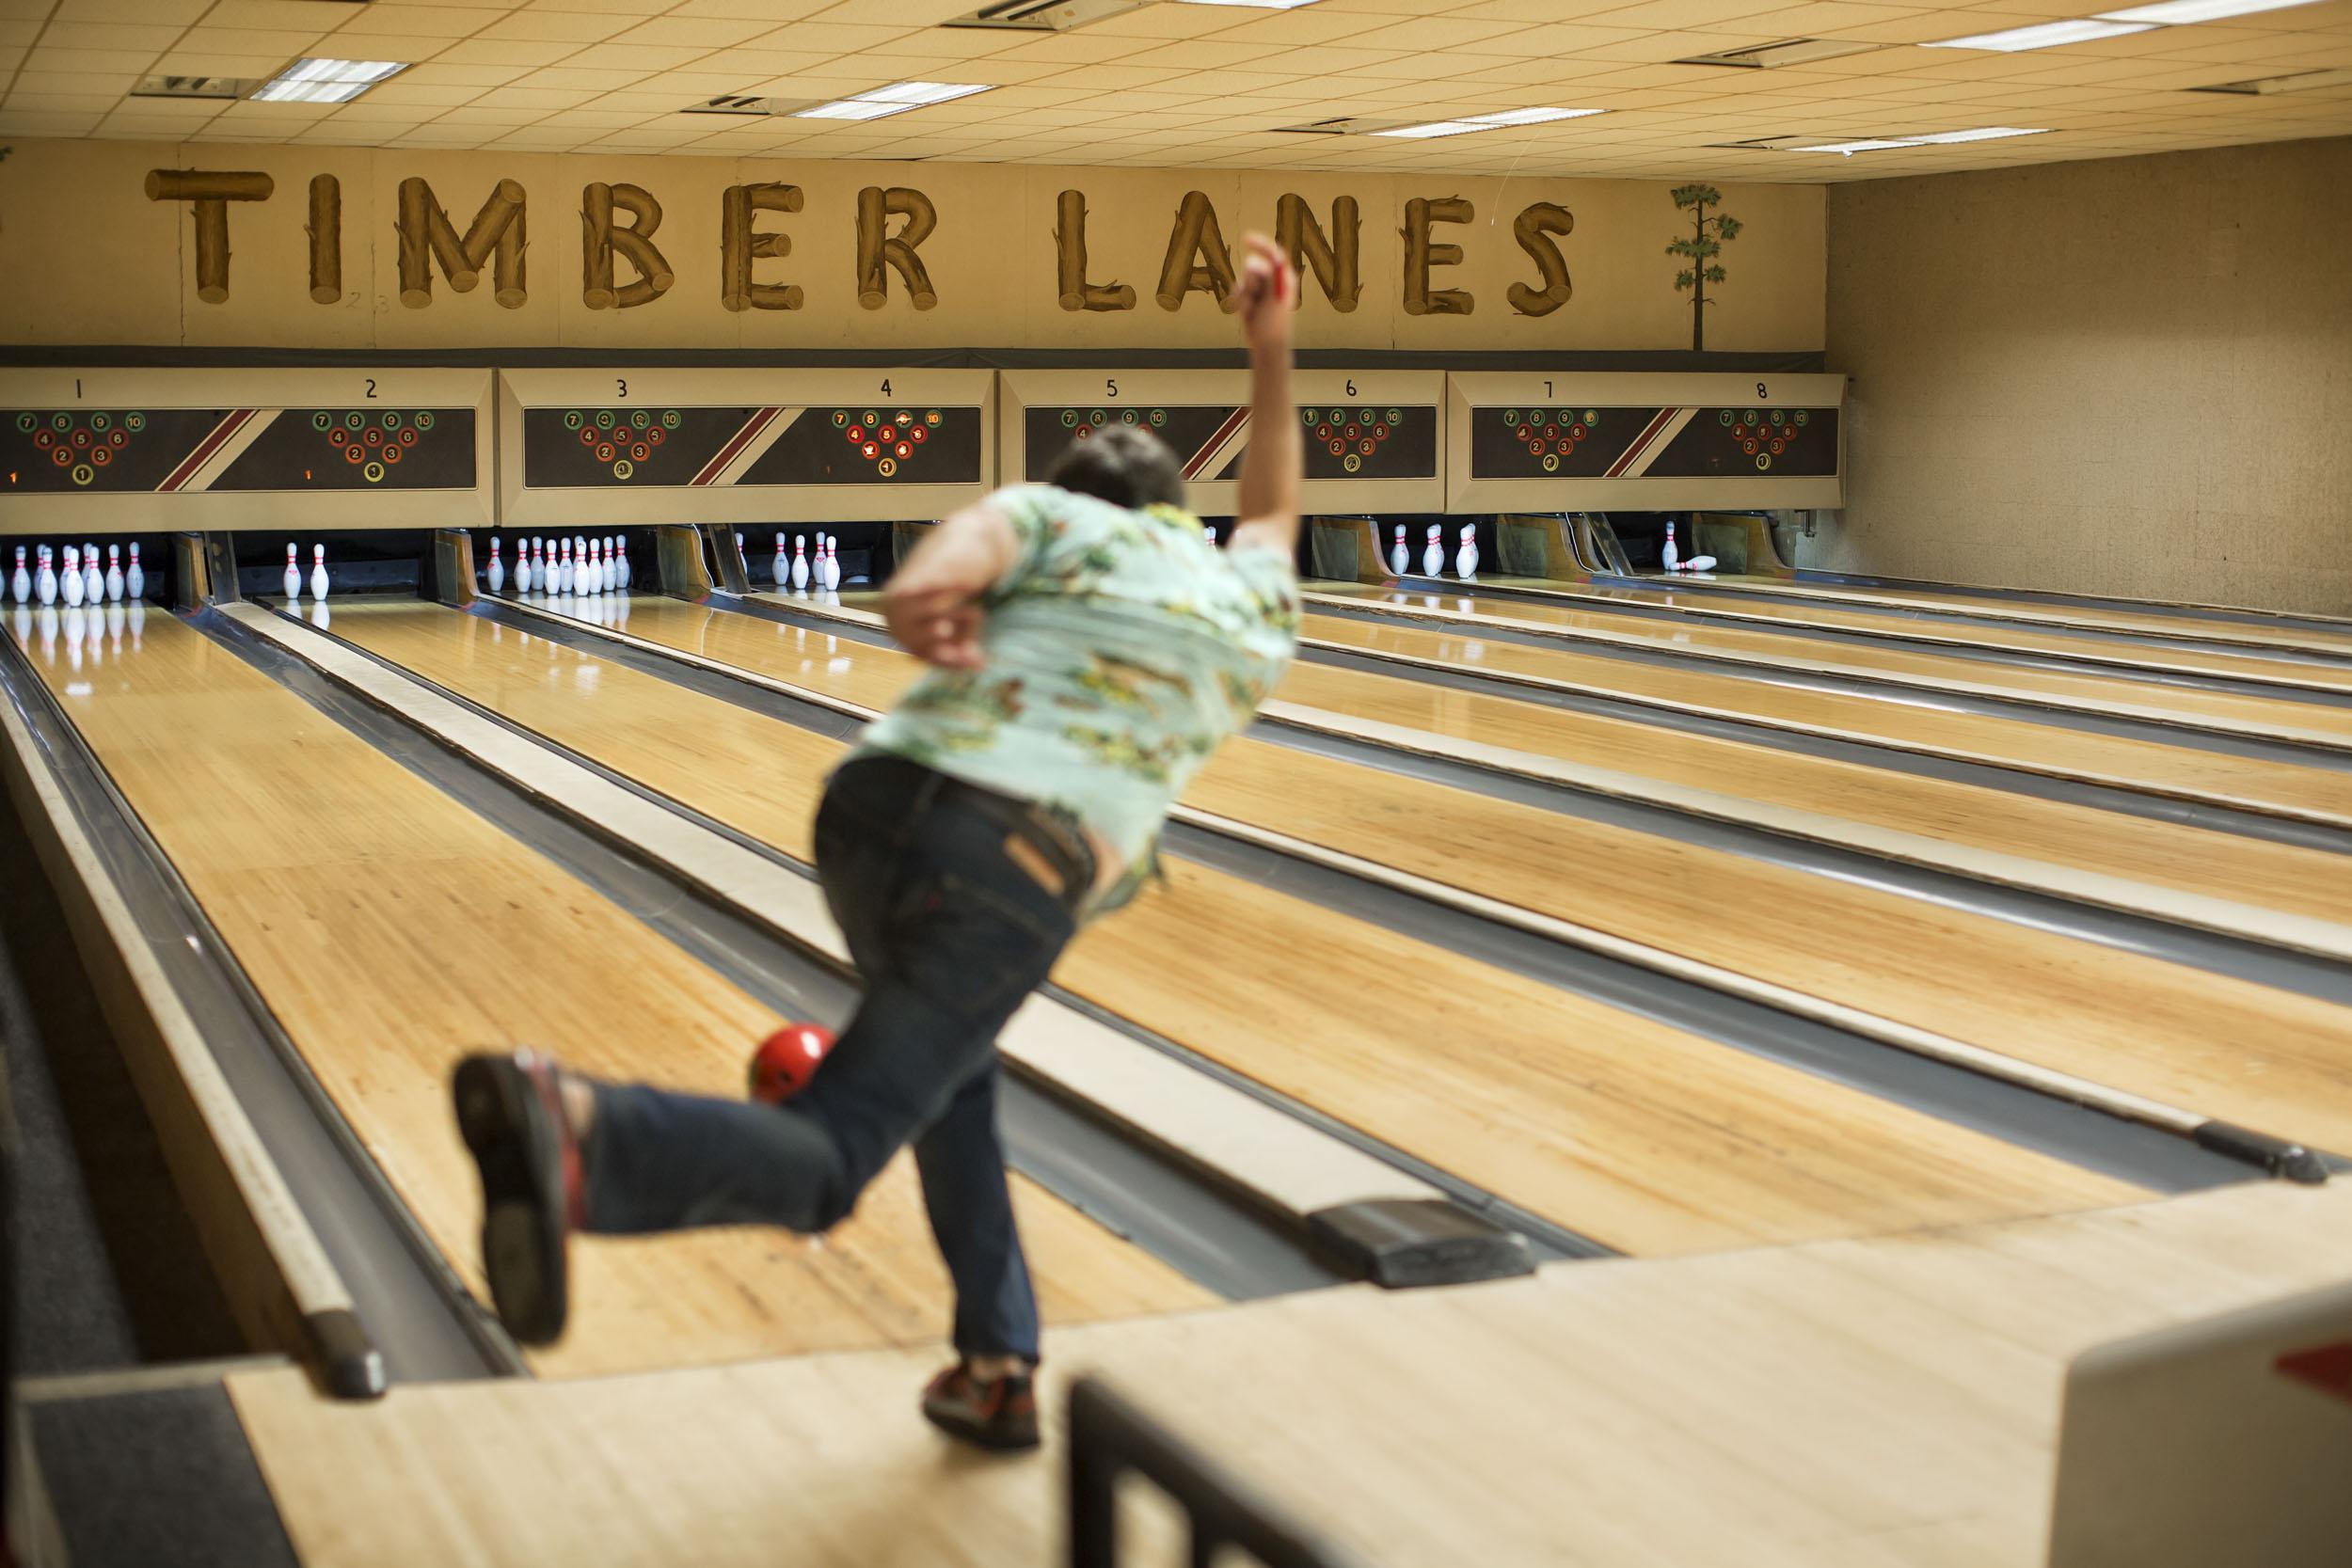 TIMBERLANES_0027-new.jpg